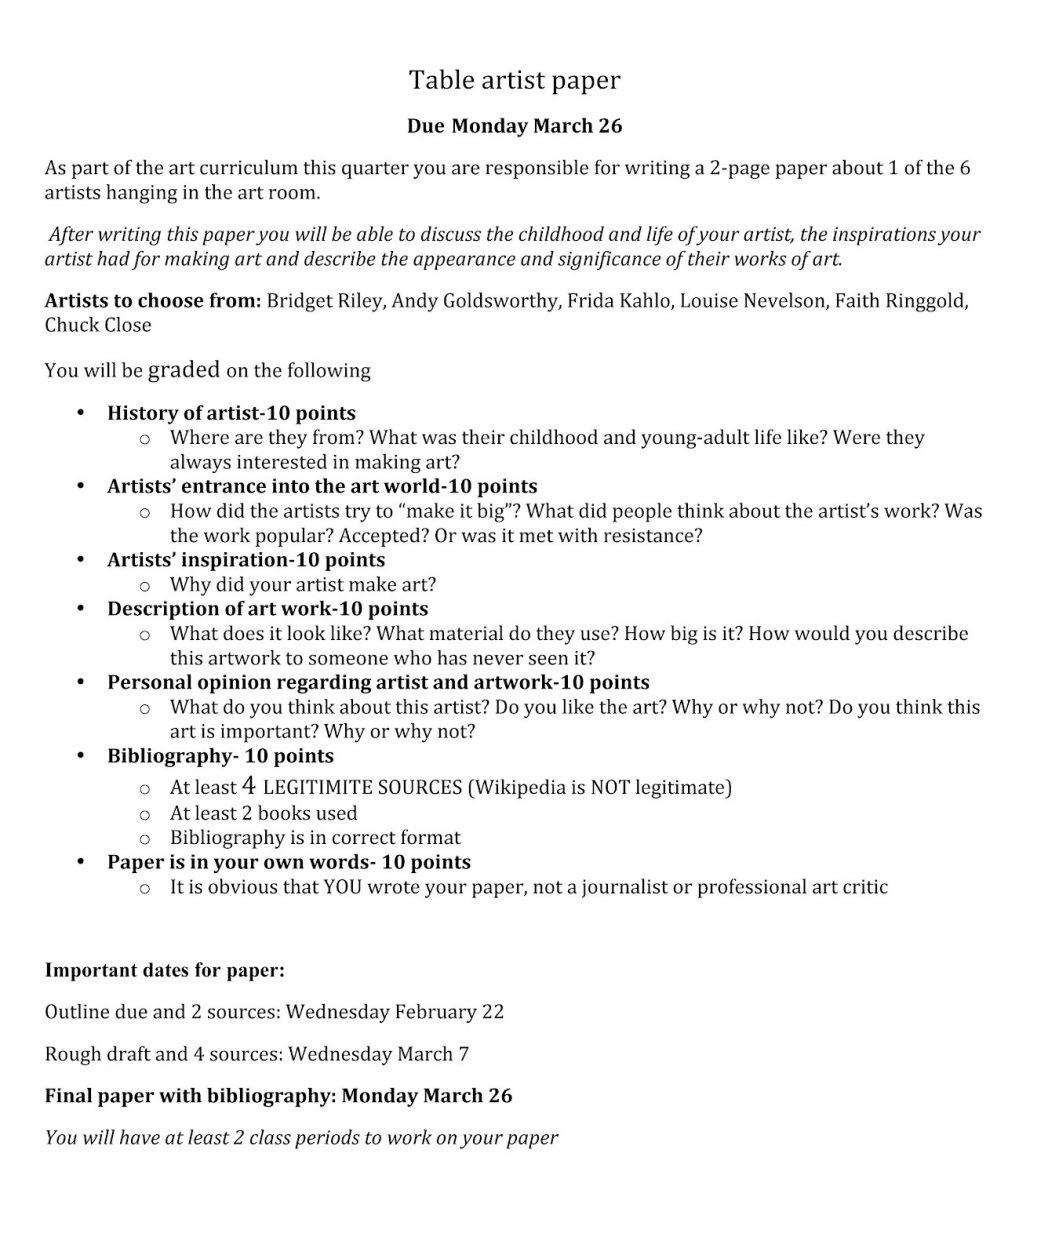 013 Art Essays College Papi Ip Hi History Metropolitan Museum Of Application Performing Arts School Culinary Liberal Martial 1048x1255 Formidable Essay Examples Conclusion A2 Full